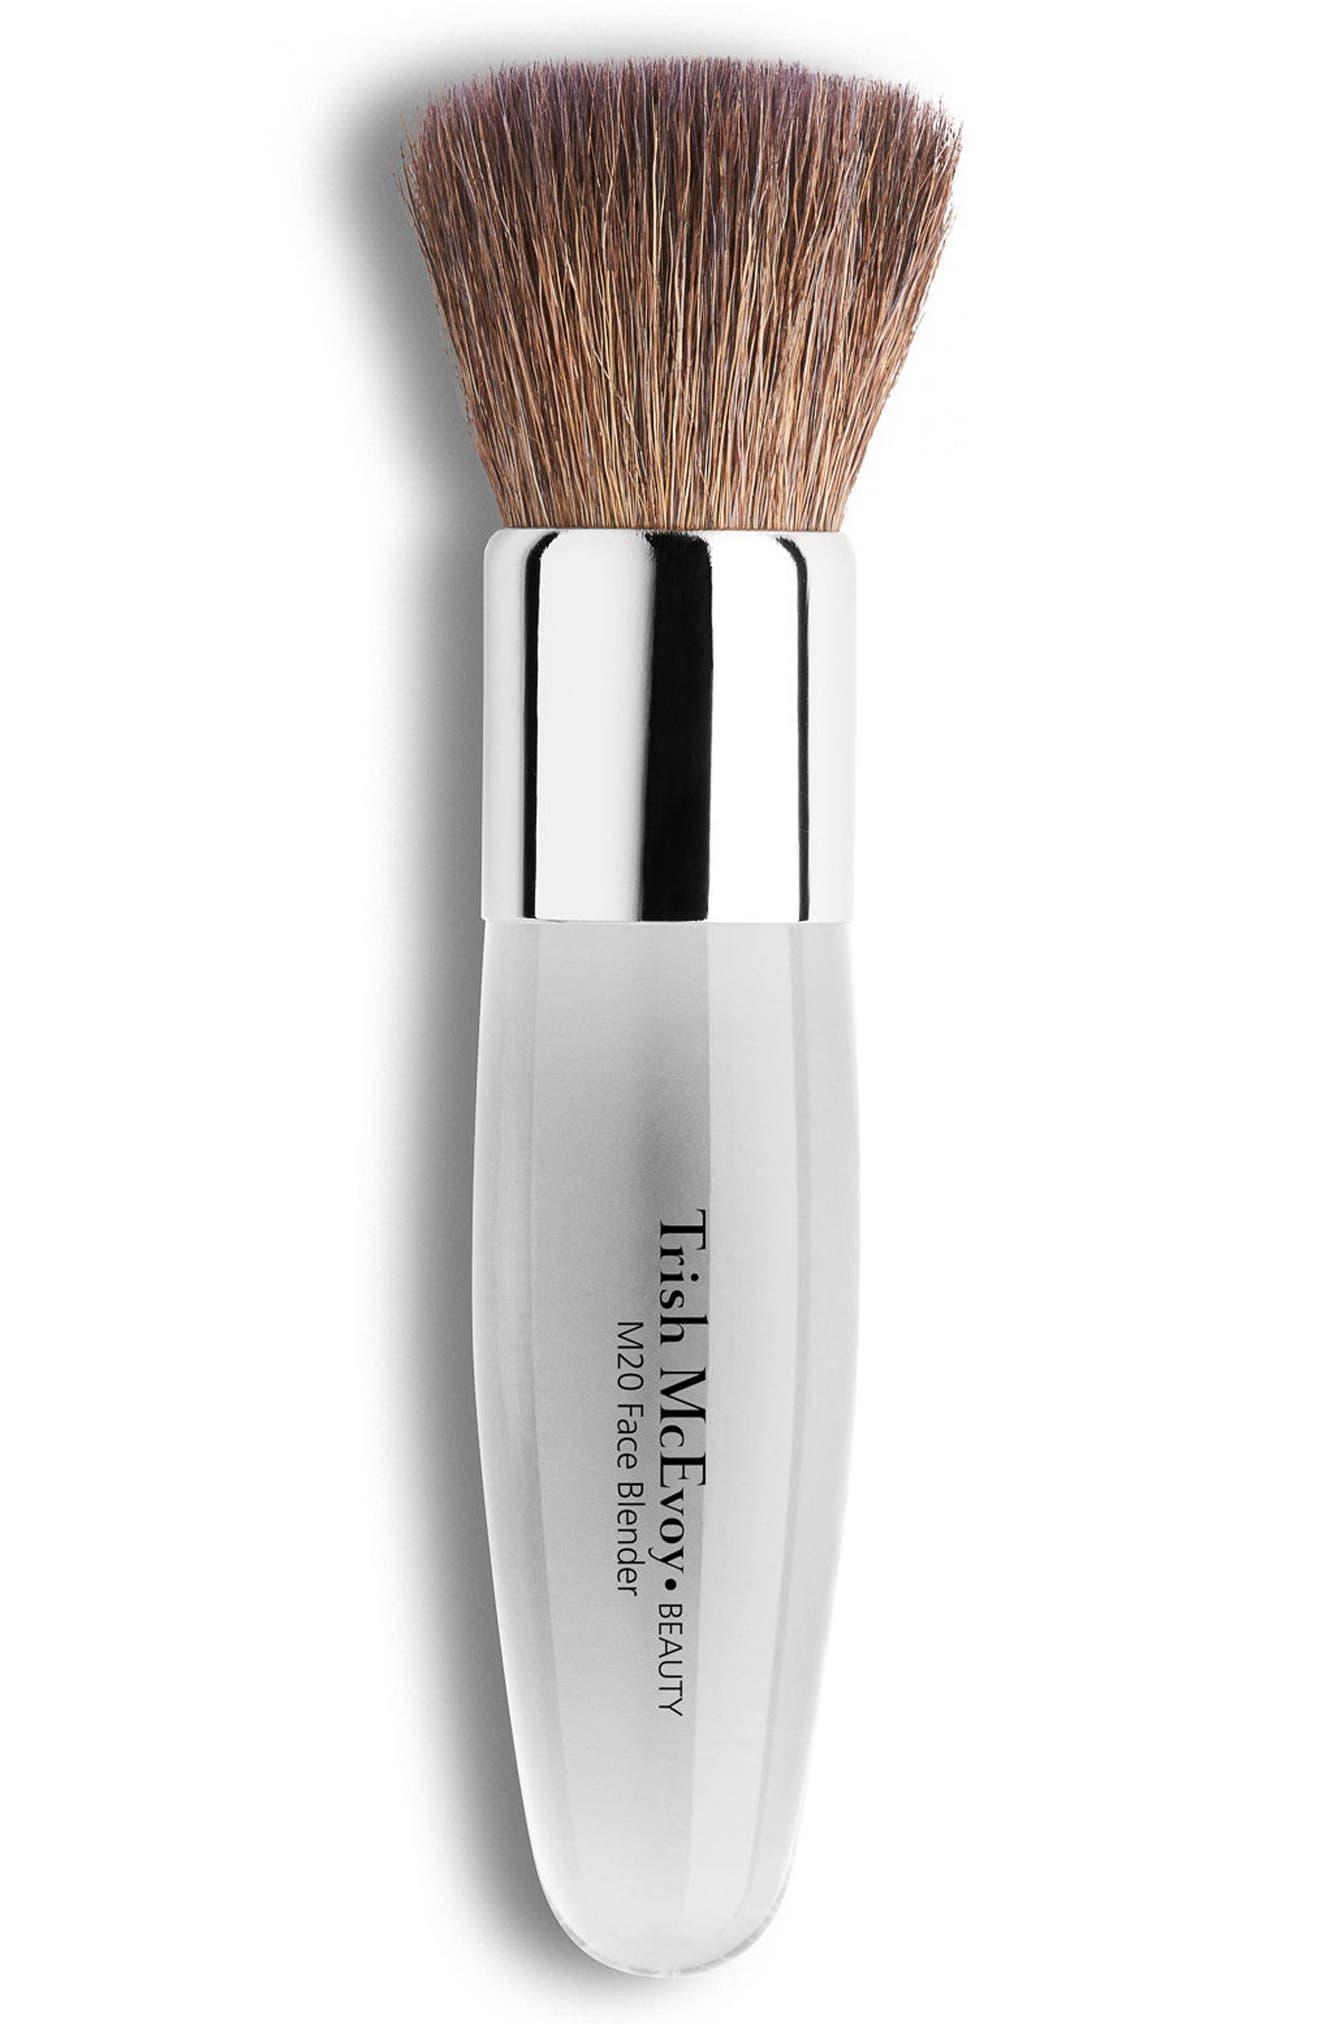 #M20 Face Blender Brush,                             Main thumbnail 1, color,                             000